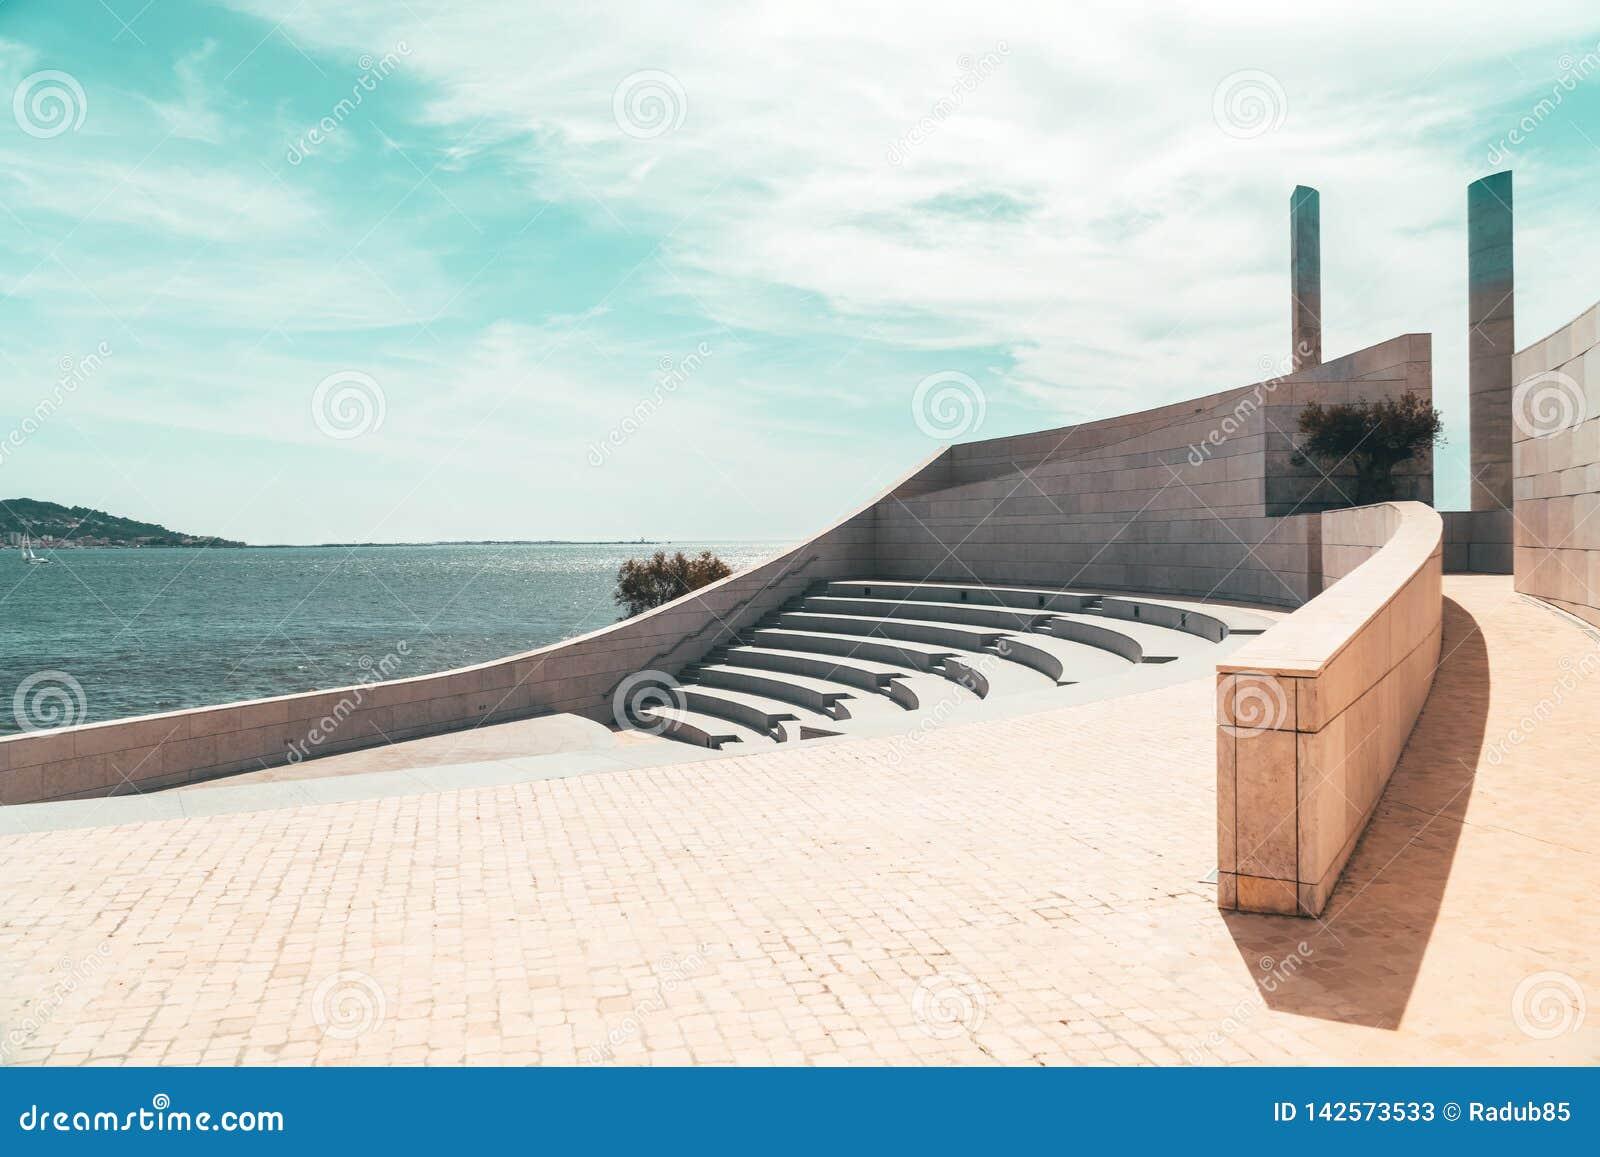 Minimalismzetels en Treden van Modern Amfitheater